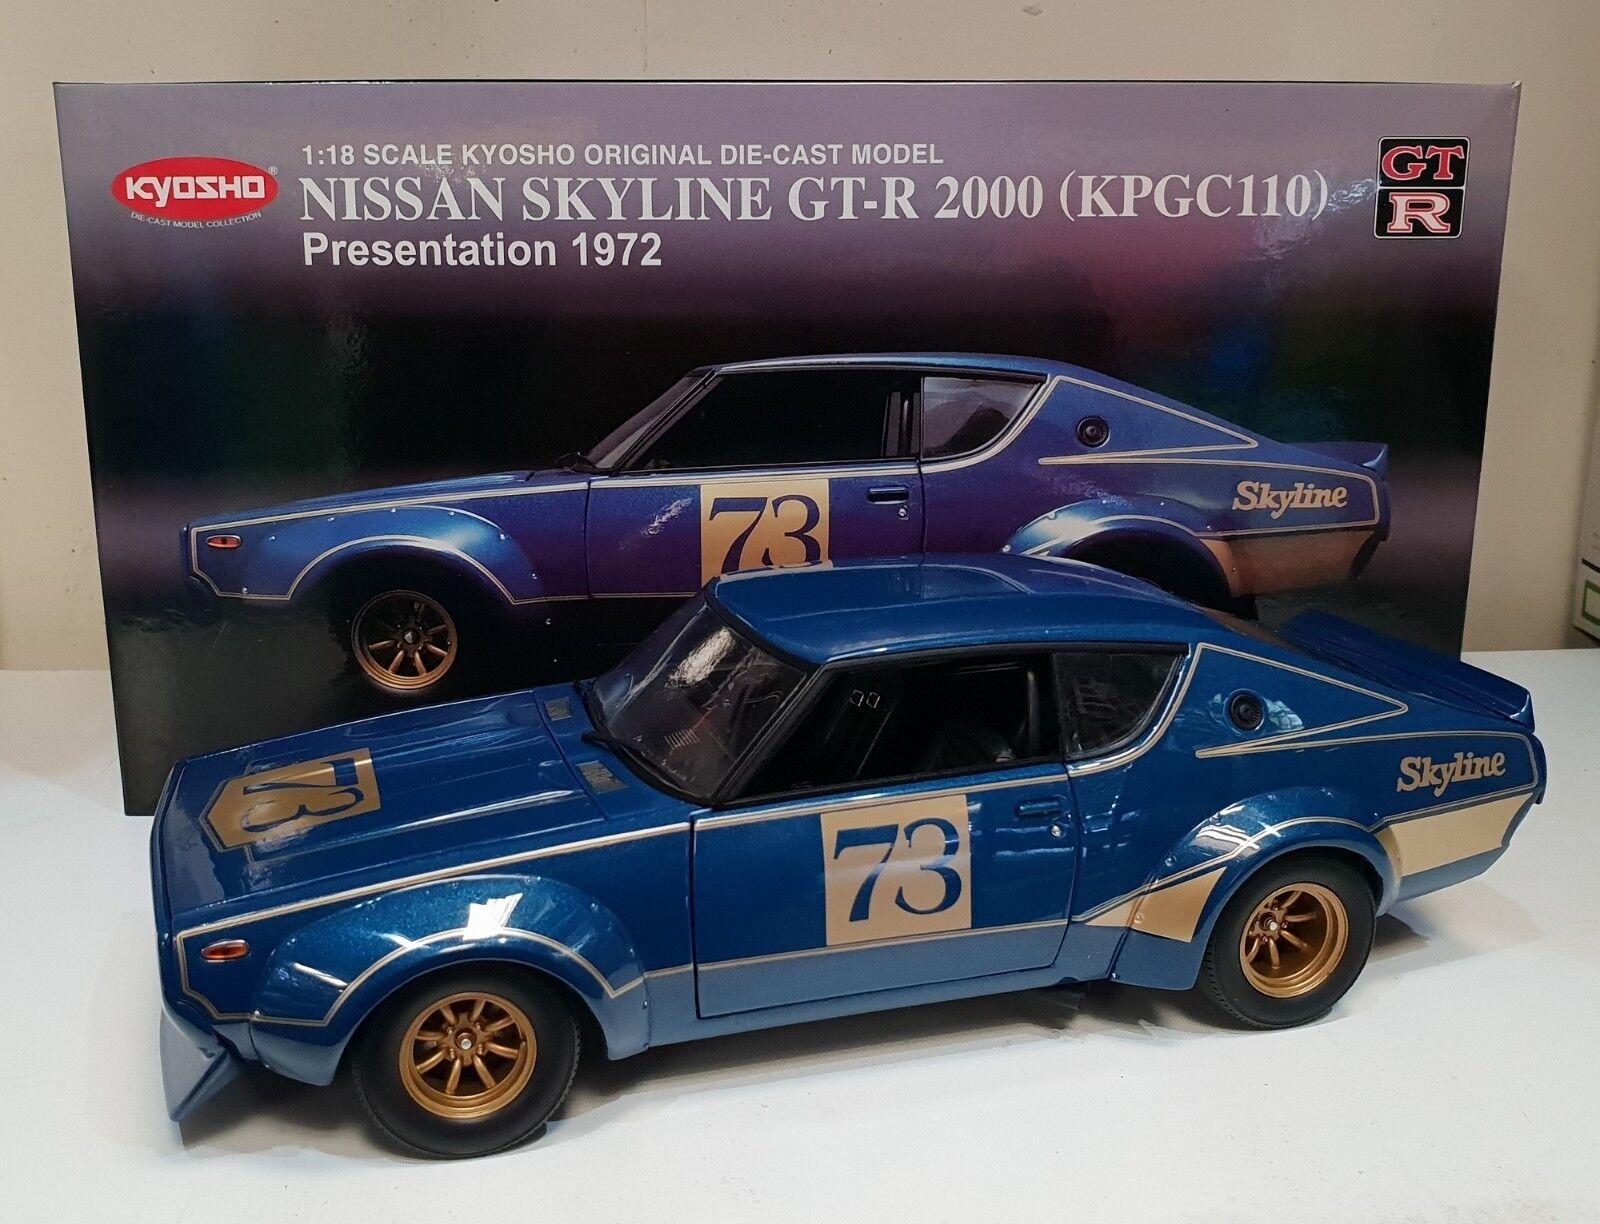 1 18 Scale Kyosho Nissan Skyline GT-R 2000 (KPGC110) Metallic bleu  73